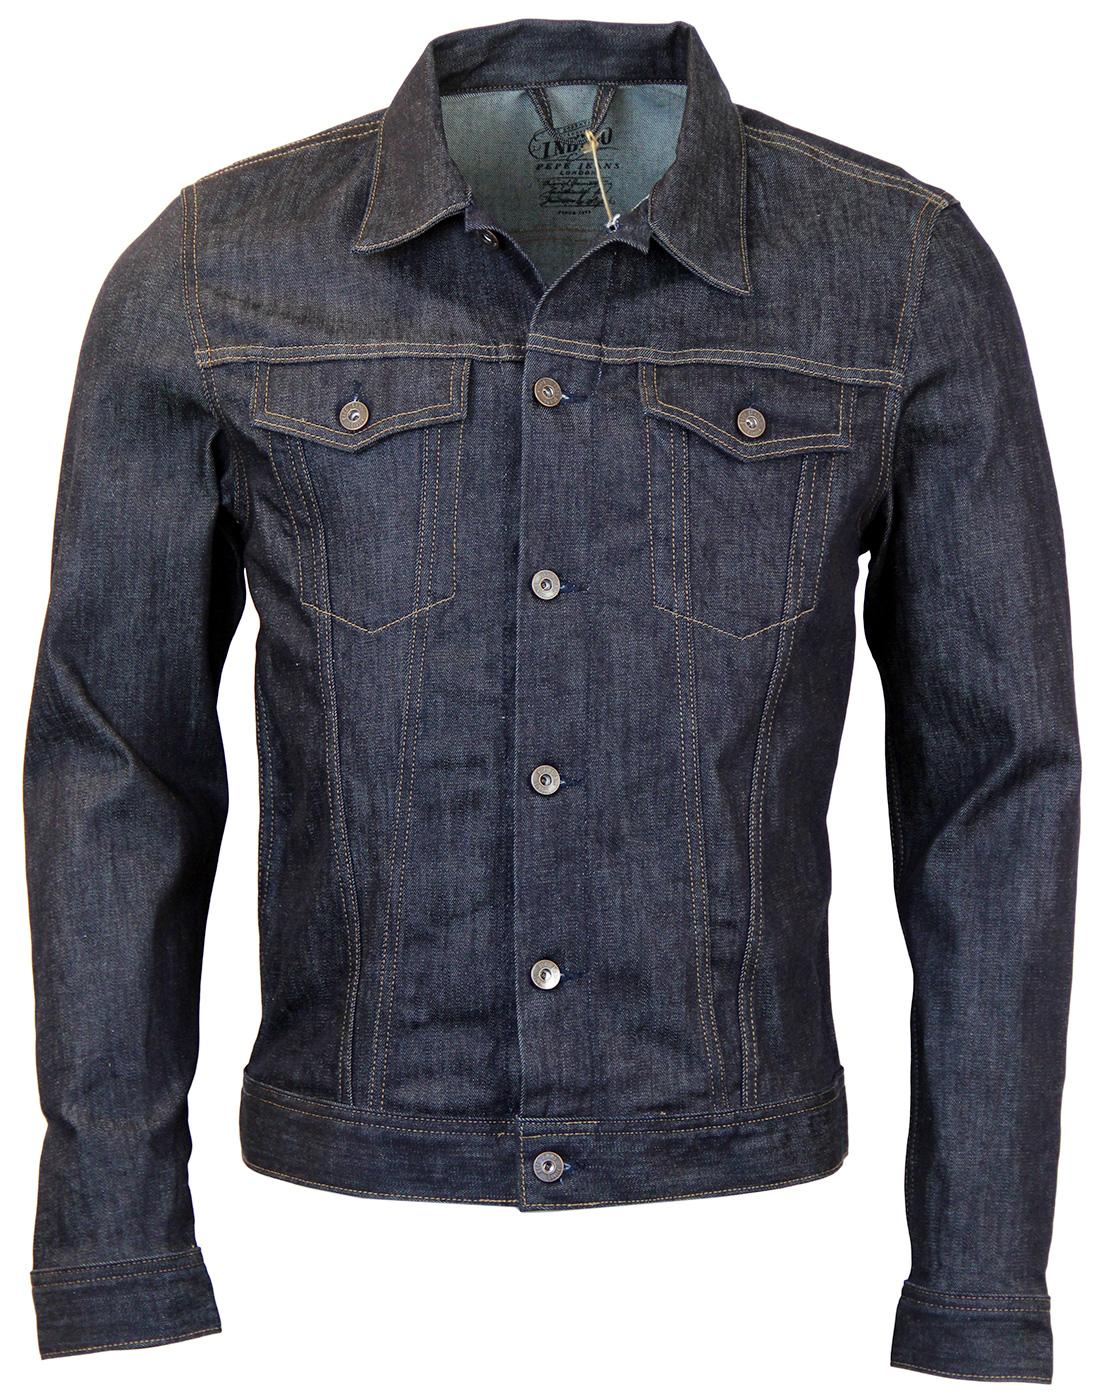 Boxter PEPE JEANS Retro Mod Dark Denim Jacket